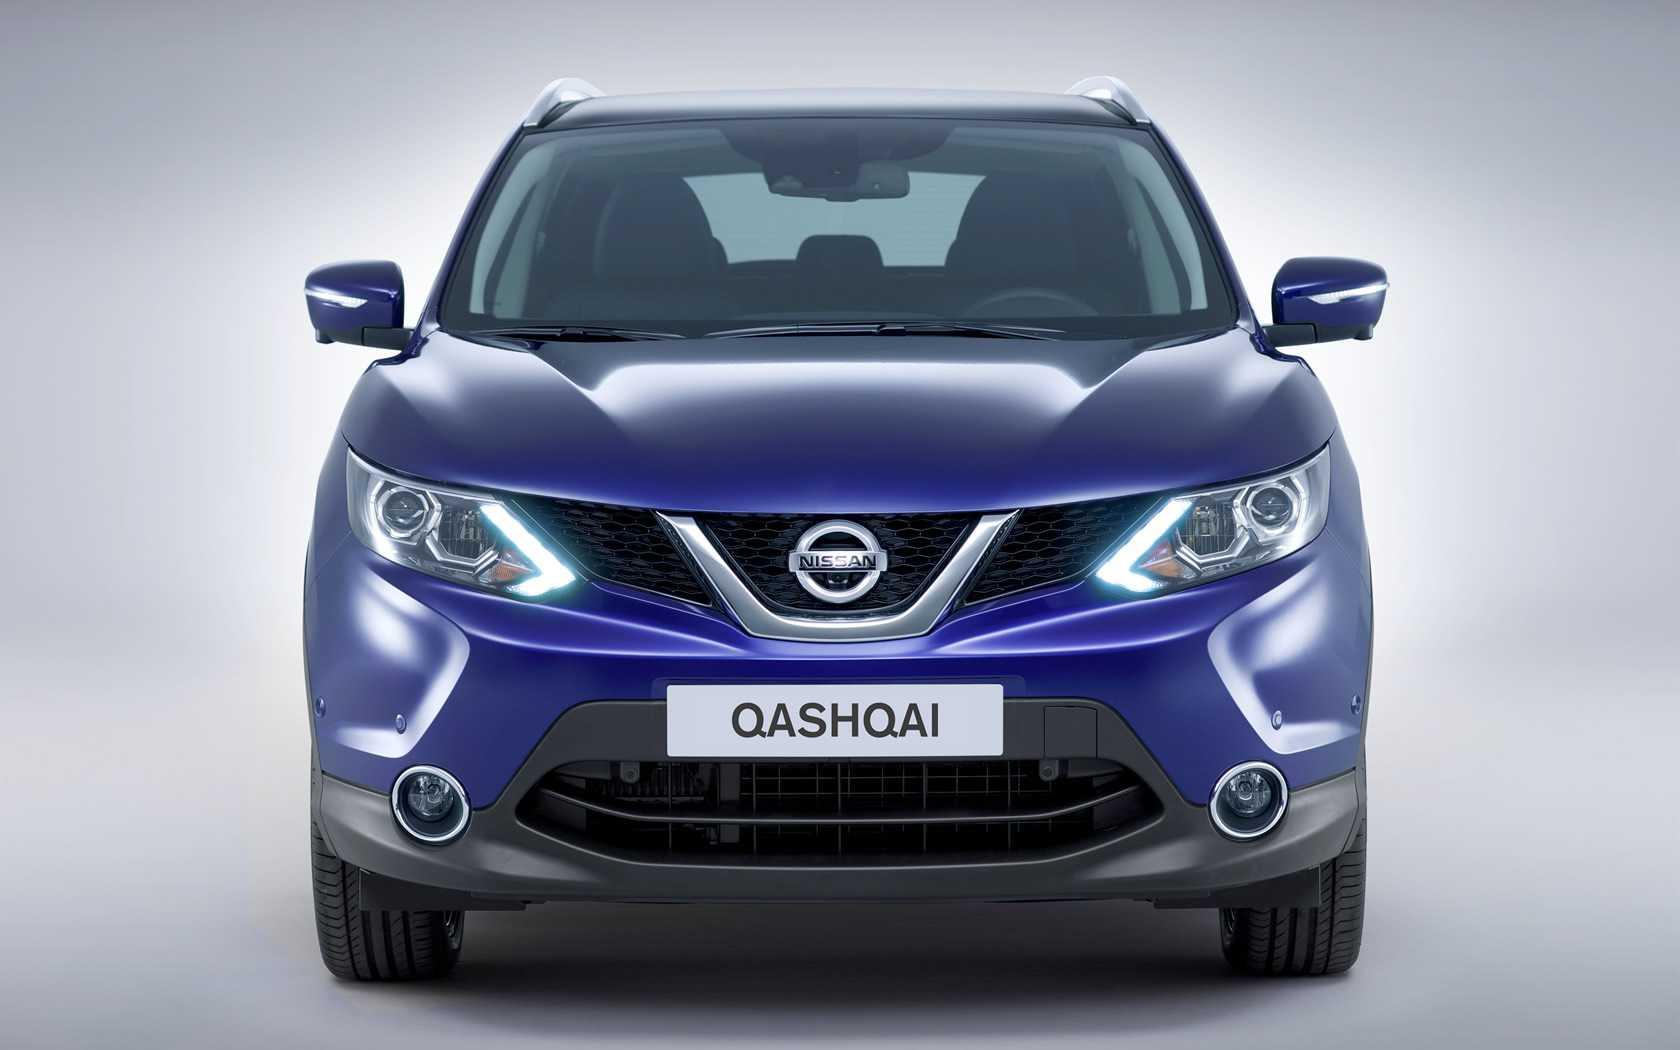 2015 Nissan Yeni Qashqai Otomatik Fiyatı Belli Oldu 20-11-2014 Galeri